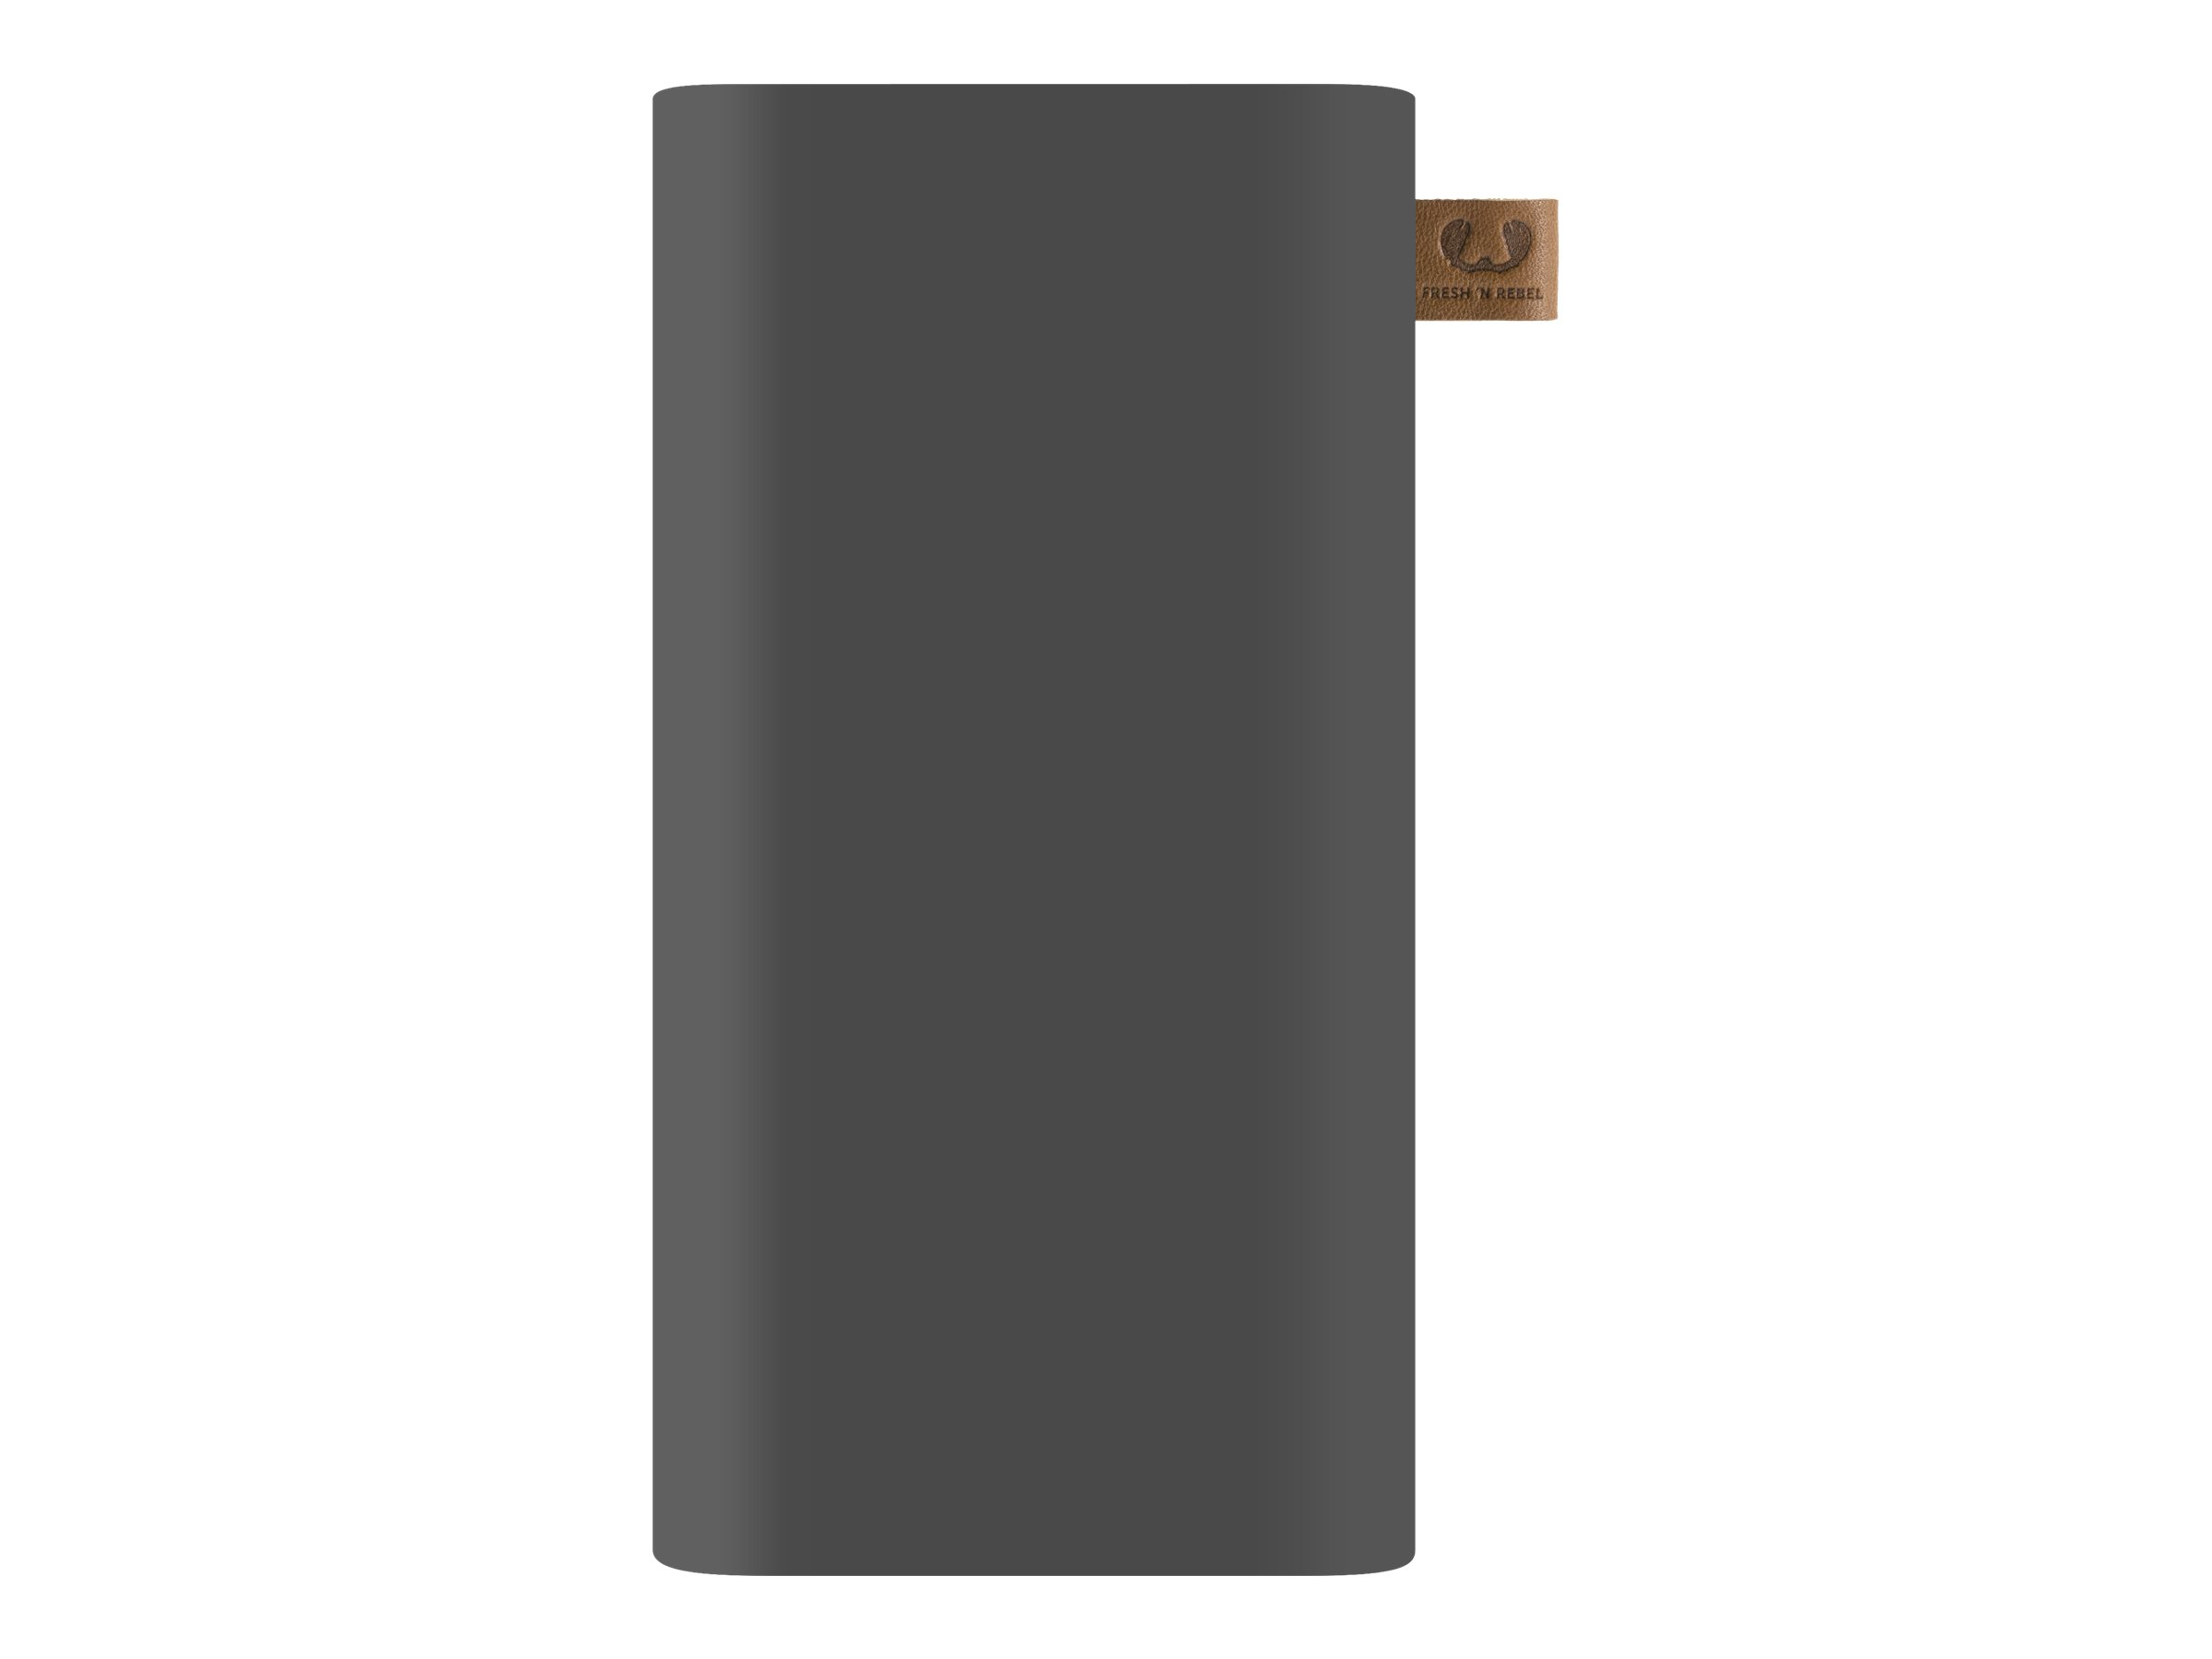 Fresh 'n Rebel Powerbank 18000 - Powerbank - 18000 mAh - 3.1 A - 2 Ausgabeanschlussstellen (USB) - auf Kabel: USB-C